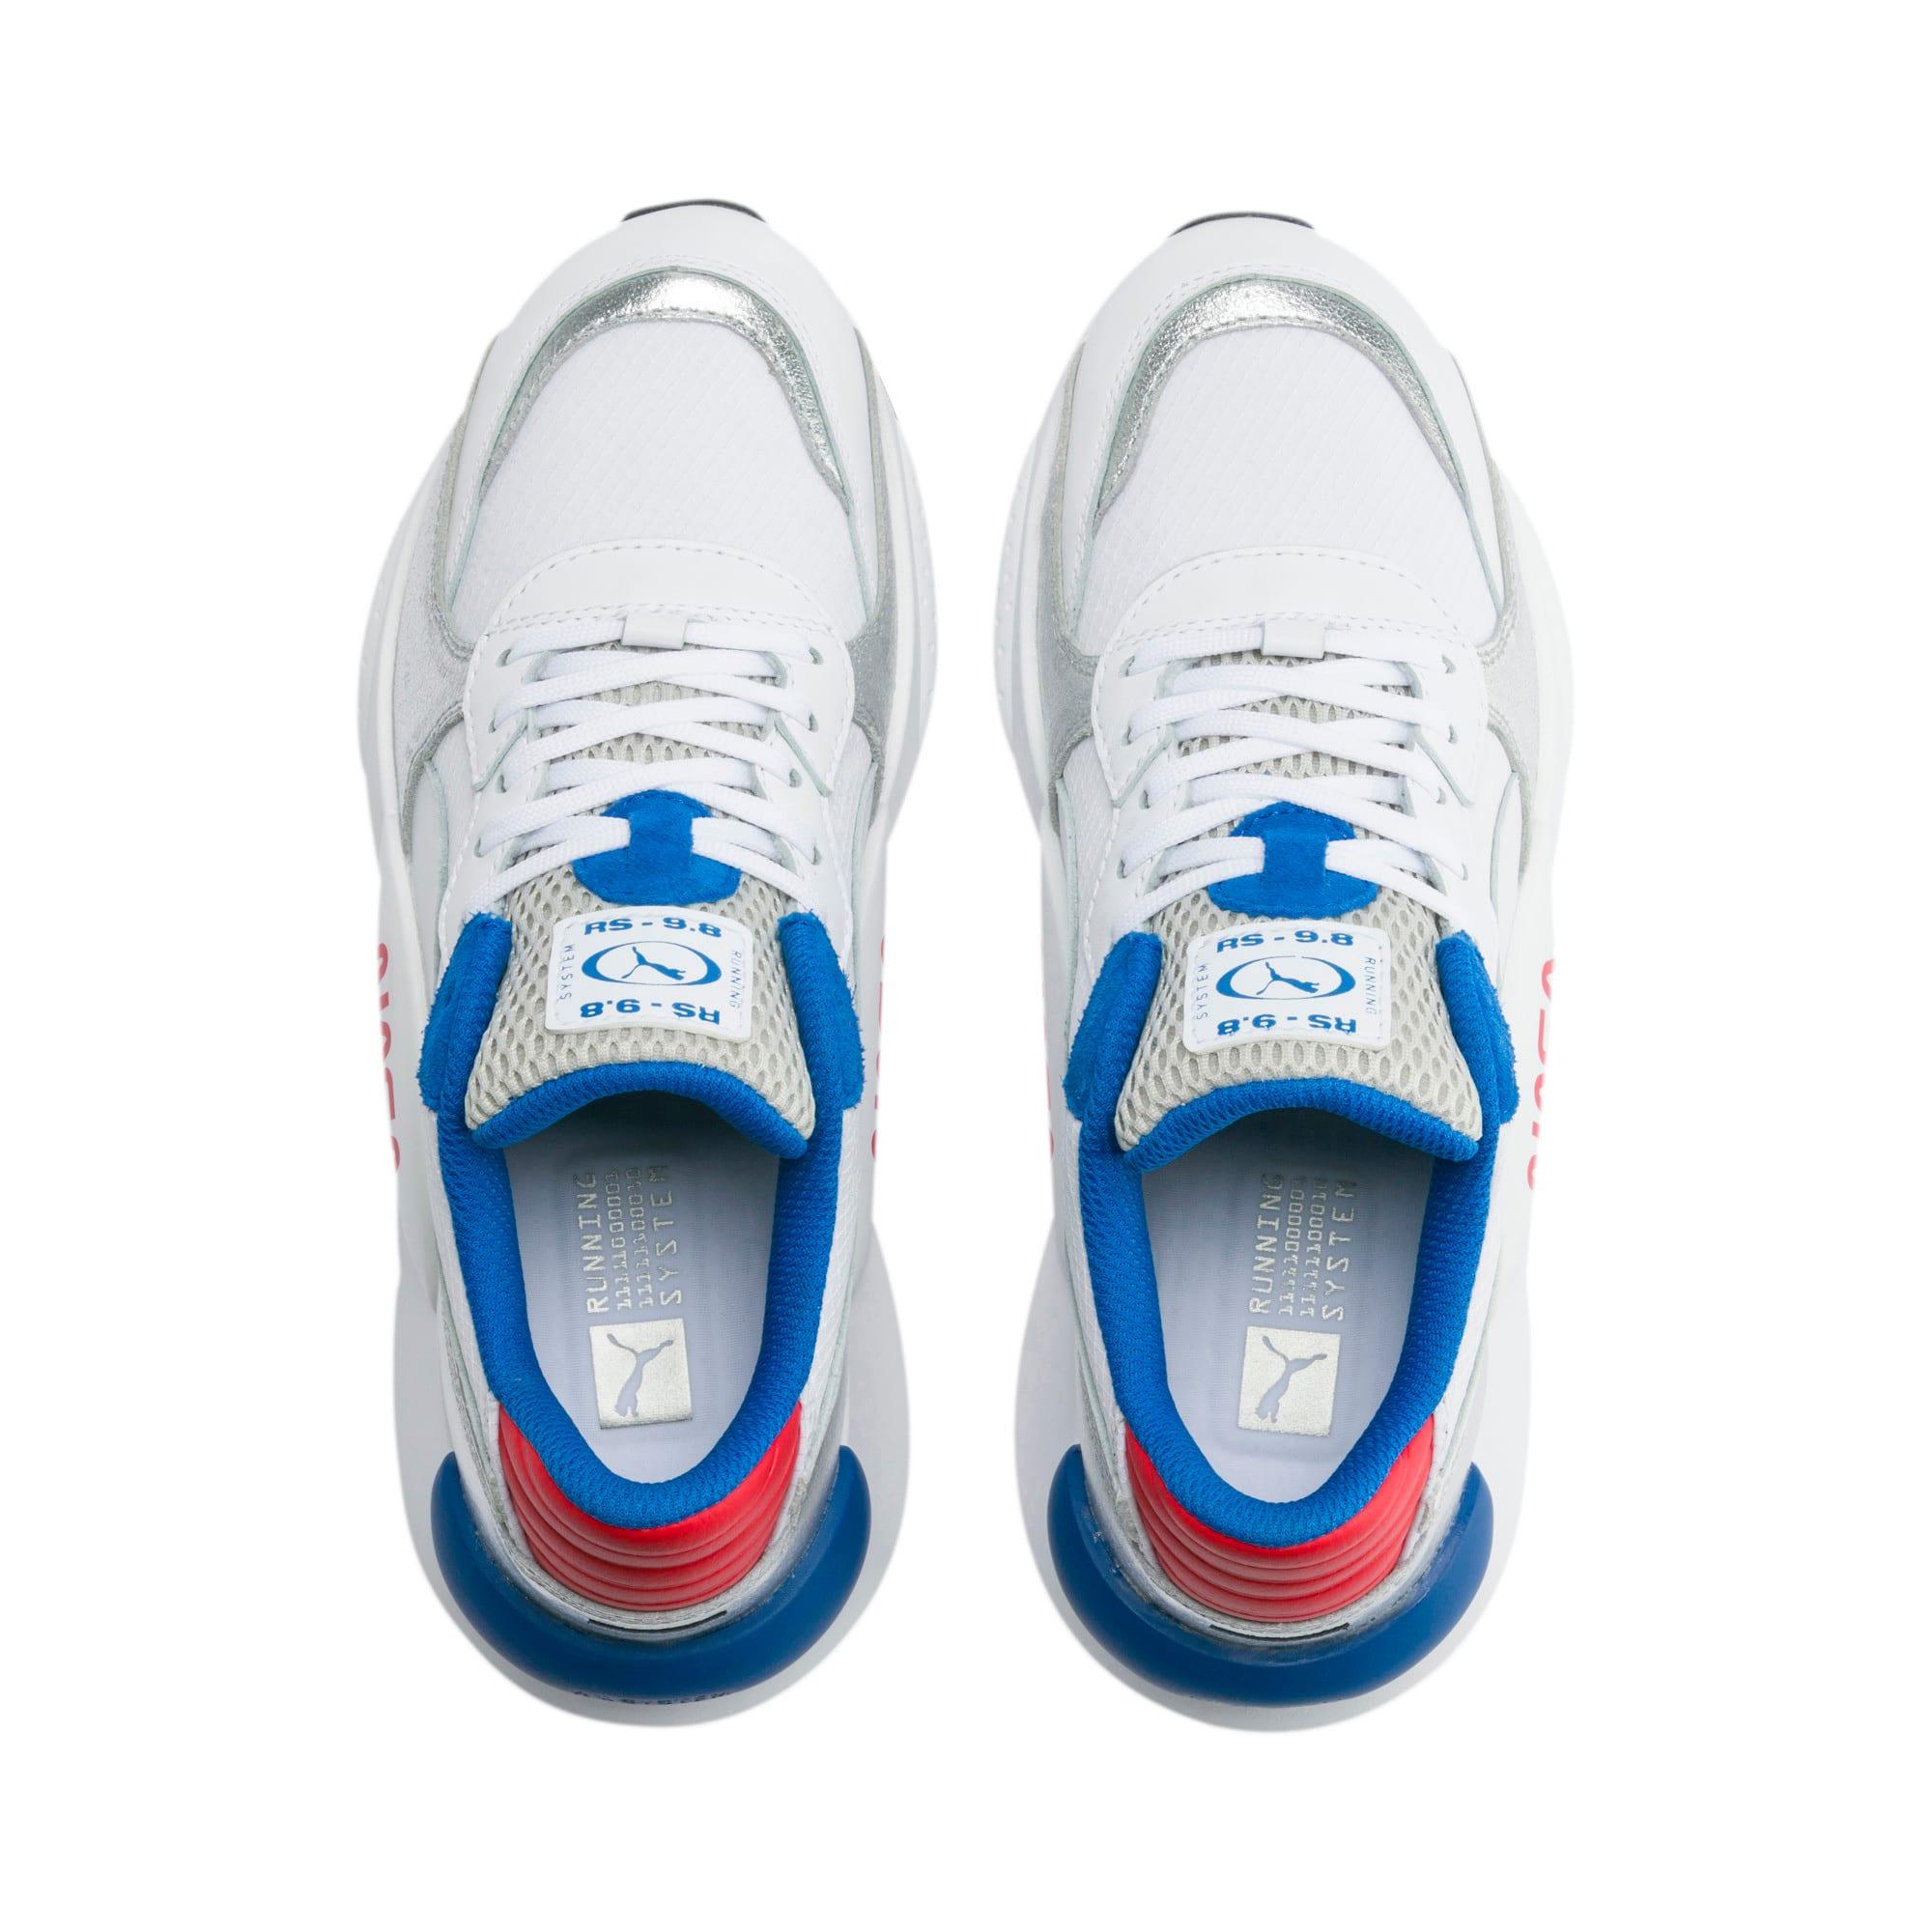 Thumbnail 6 of RS 9.8 Space Agency Sneakers JR, Puma White-Puma Silver, medium